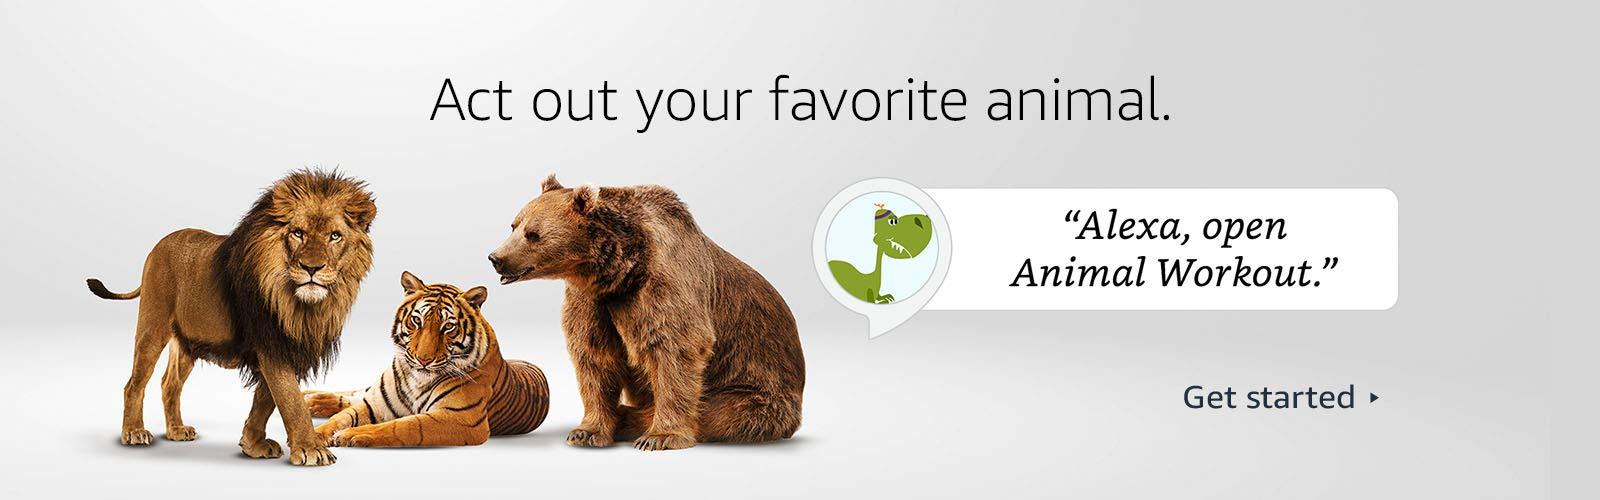 Alexa, open Animal Workout